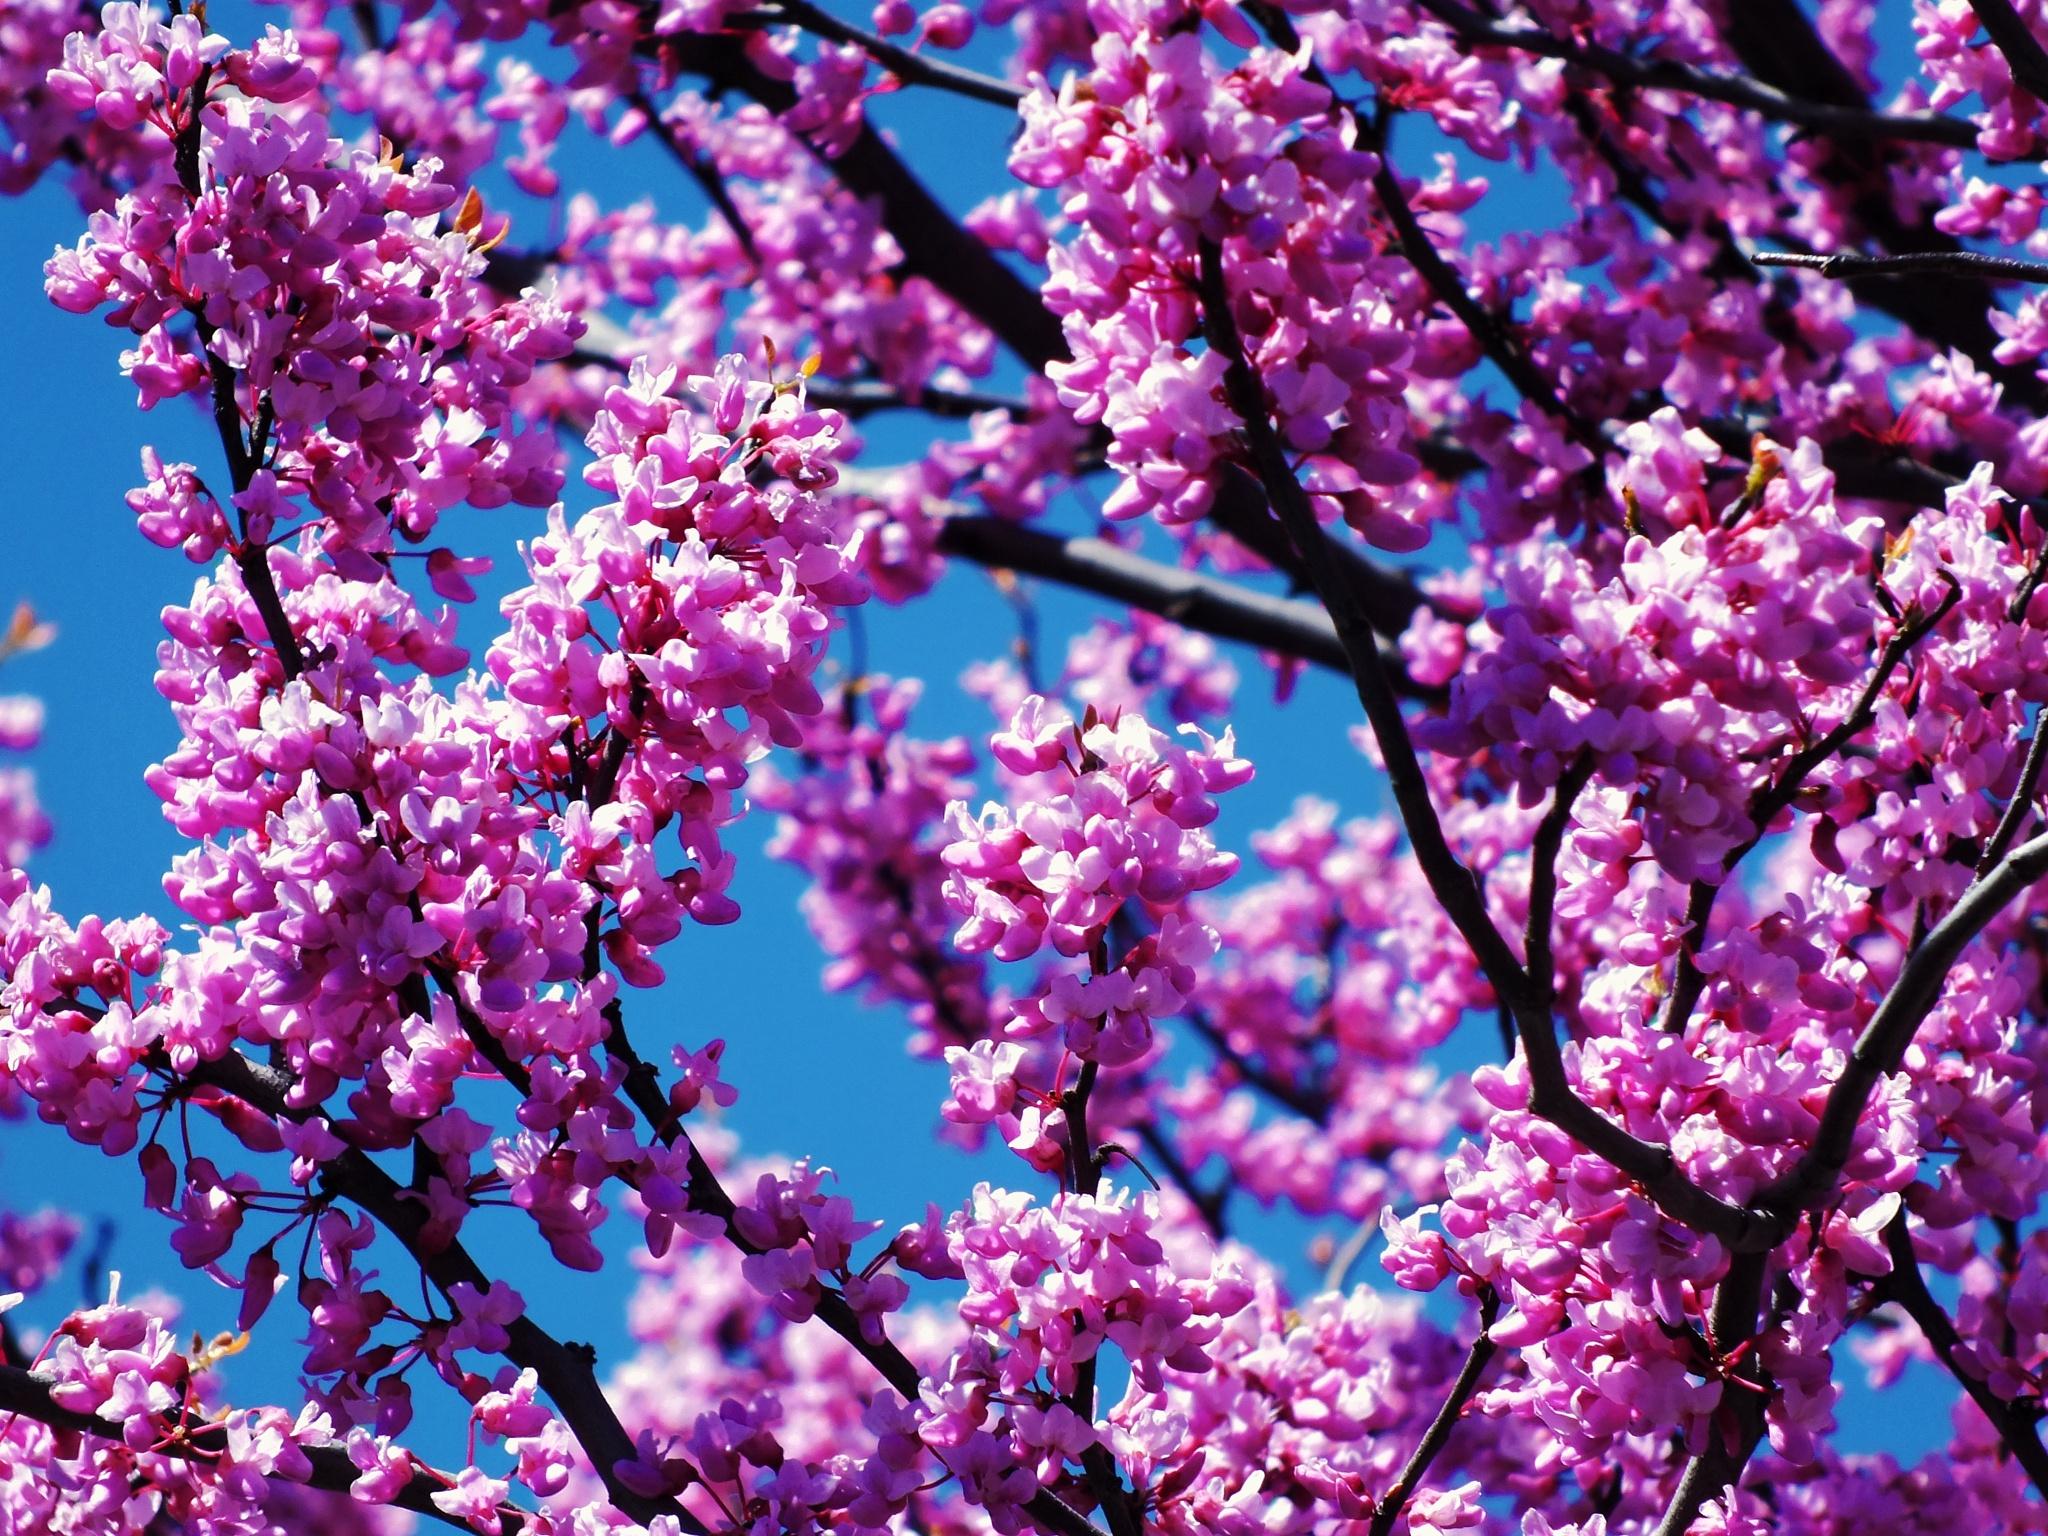 Redbud Tree Blooms by Lorenzo (Larry) Jonree